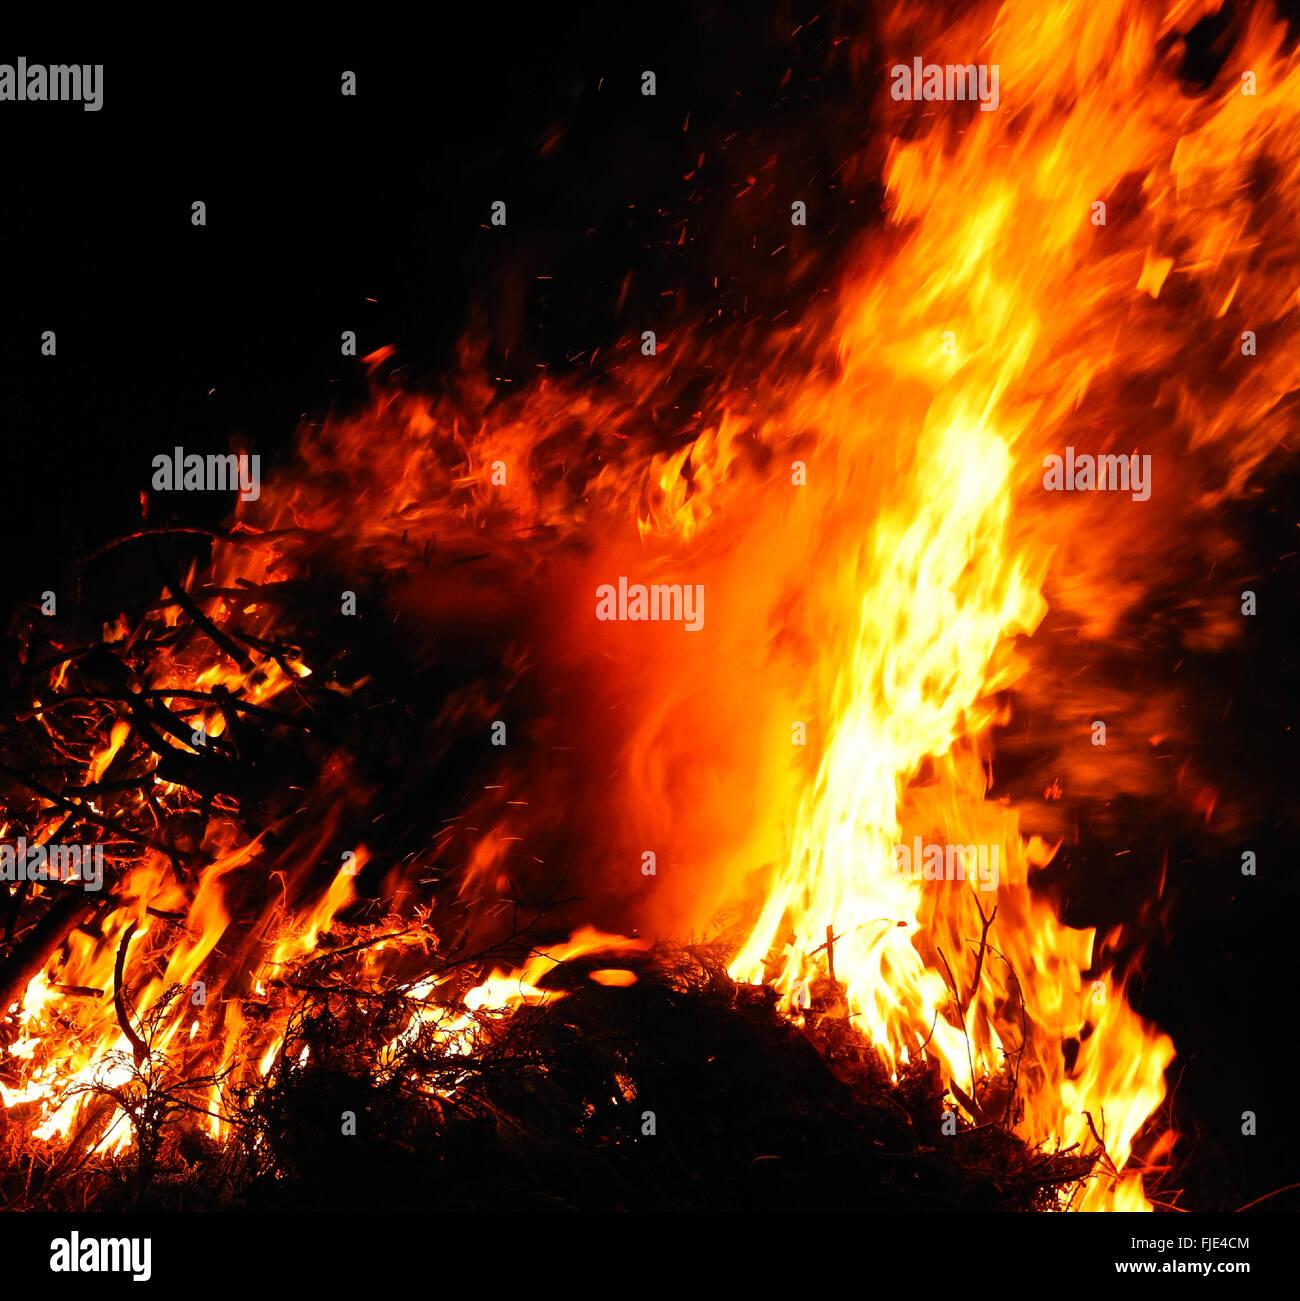 Marco Controls Flames: Bushfire Bush Fire Wild Fire Flames Burning Out Of Control